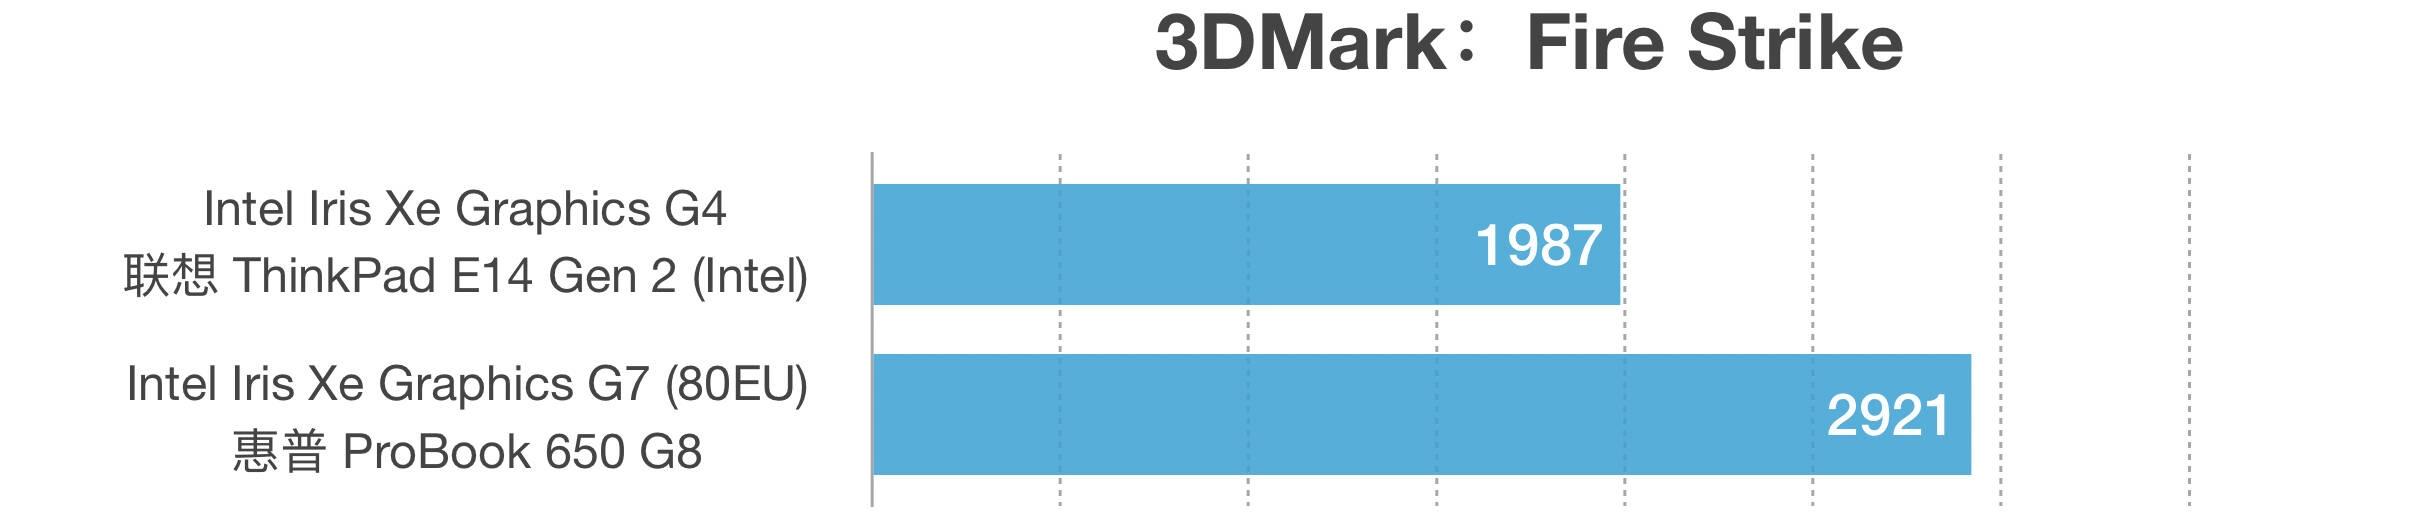 Intel Core i3-1115G4和i5-1135G7性能跑分对比评测